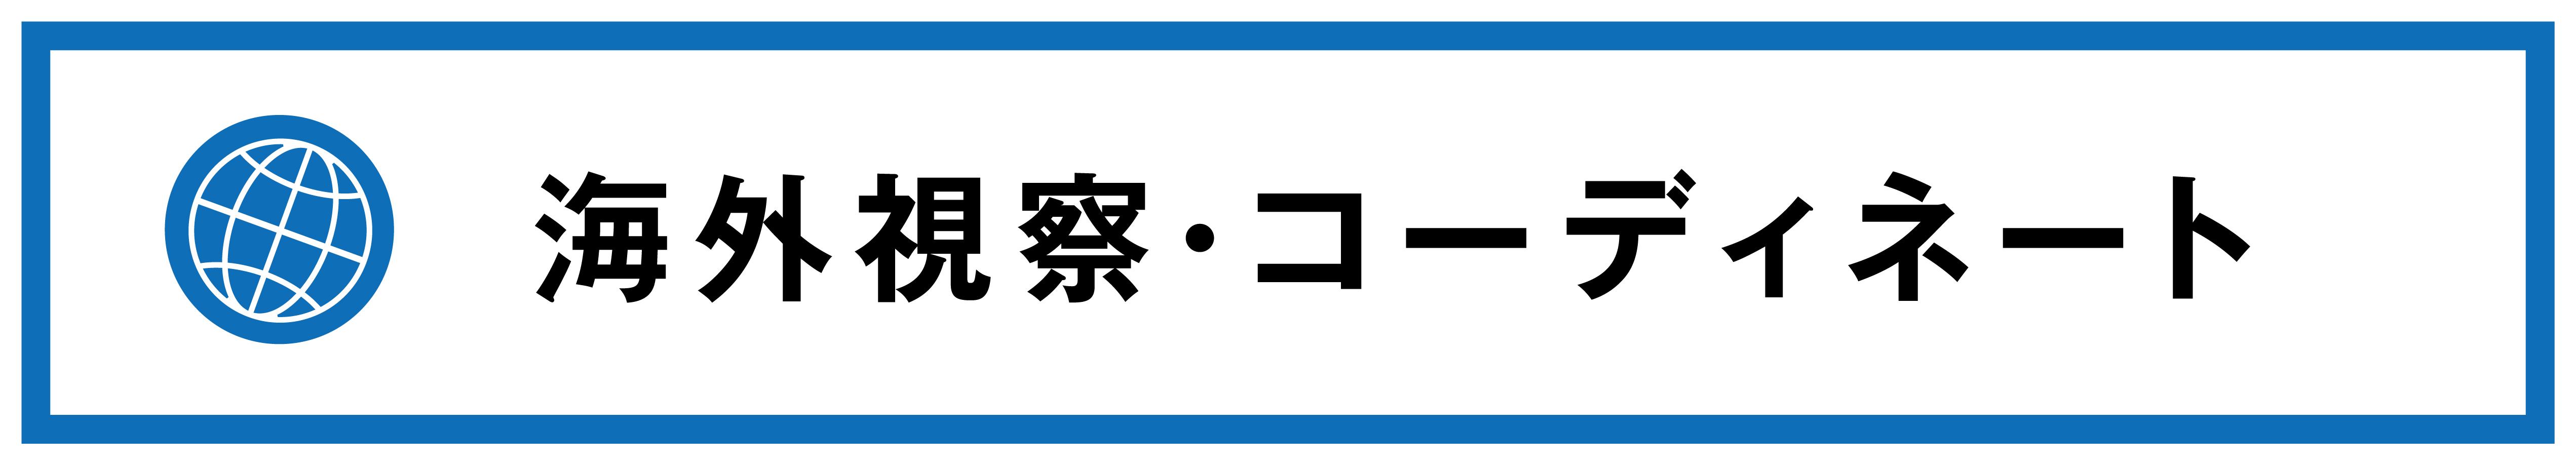 _blog_ハ?ナー 2-10.jpg